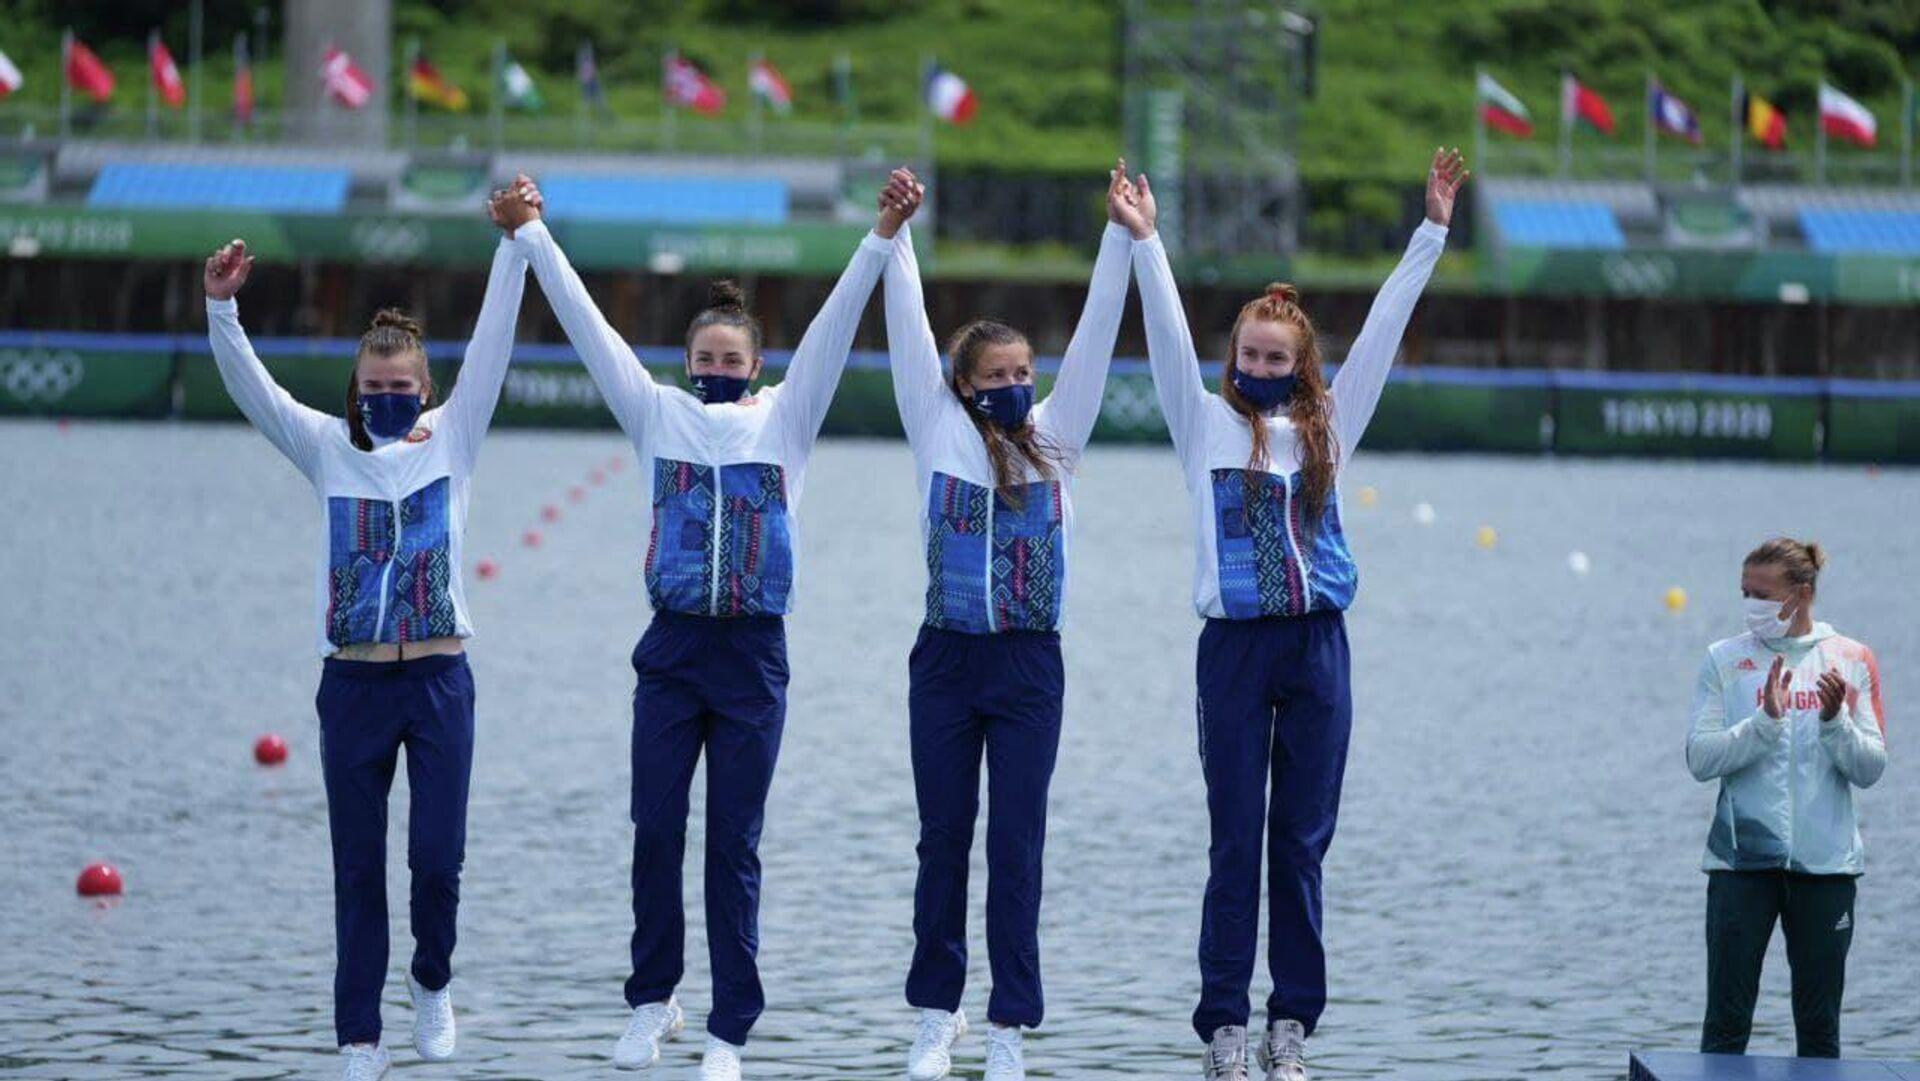 Белоруски выиграли золото на ЧМ в Дании - Sputnik Беларусь, 1920, 19.09.2021